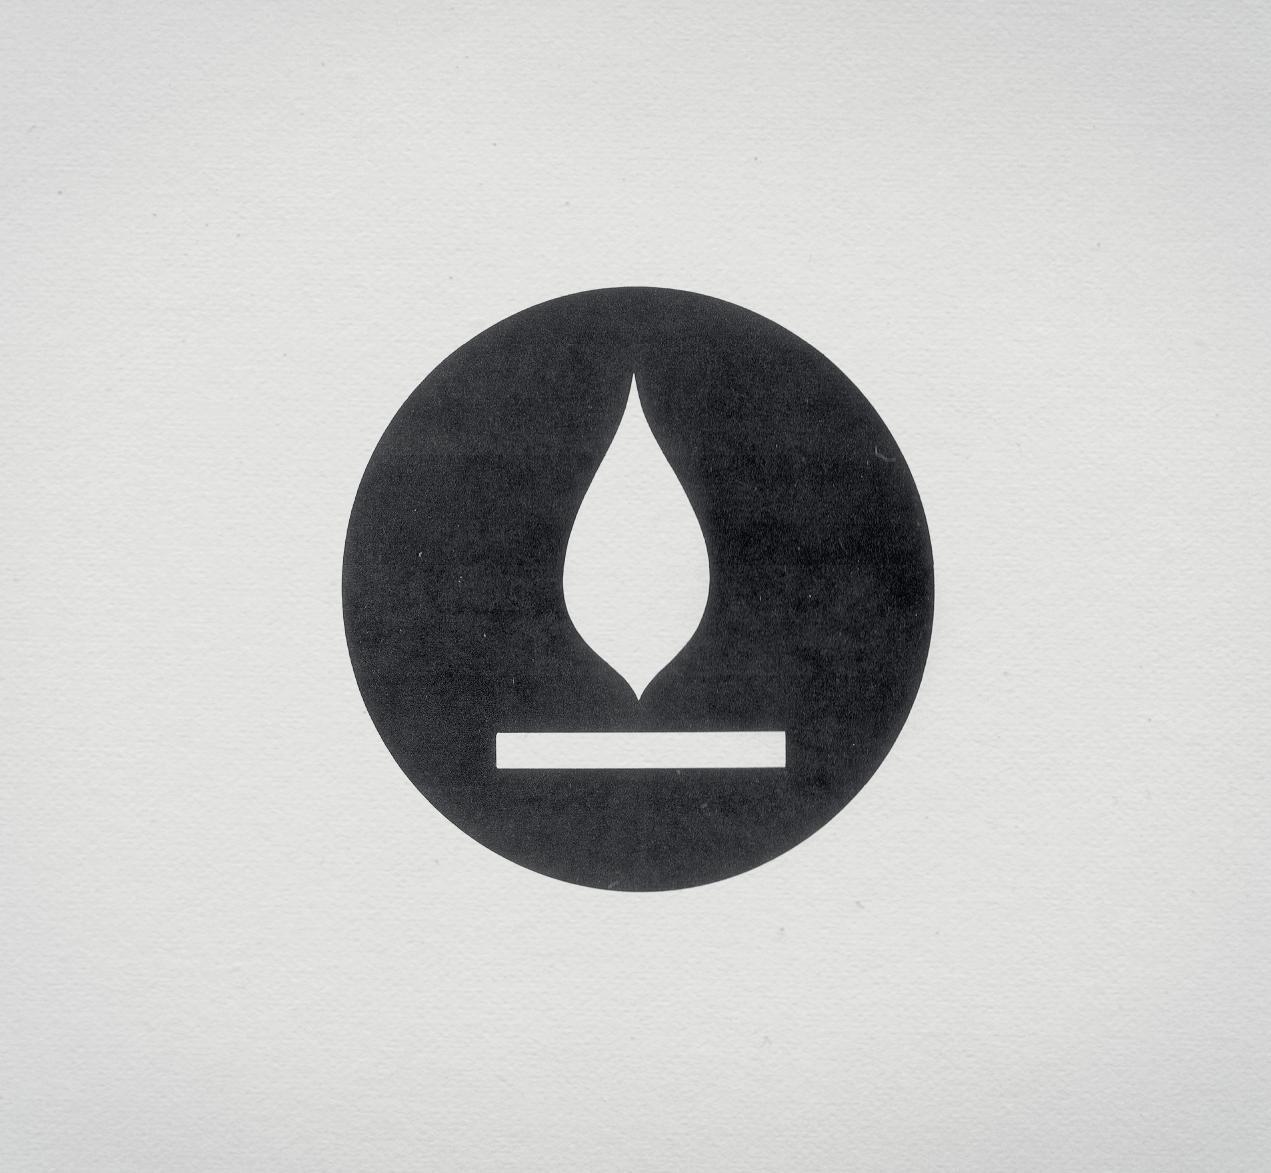 retro corporate logo